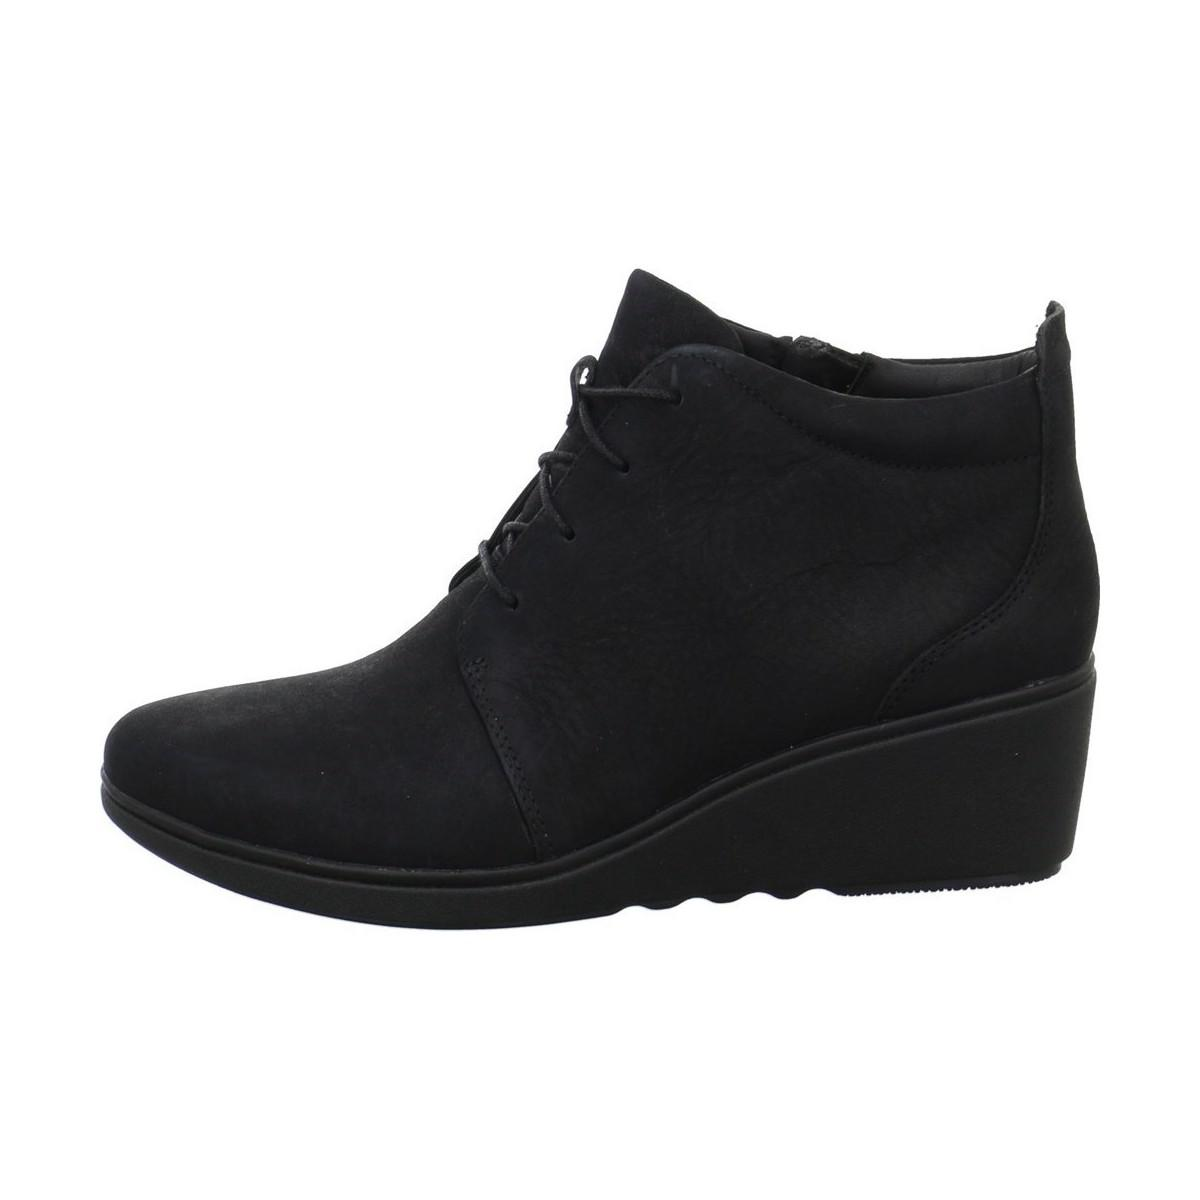 f2f32b5ce124 Clarks Black Un Tallara Esa Leather Wedge Long Boot  low priced 660b5 8ab9a  Clarks. Un Tallara Eva Womens Low Ankle Boots In Black ...